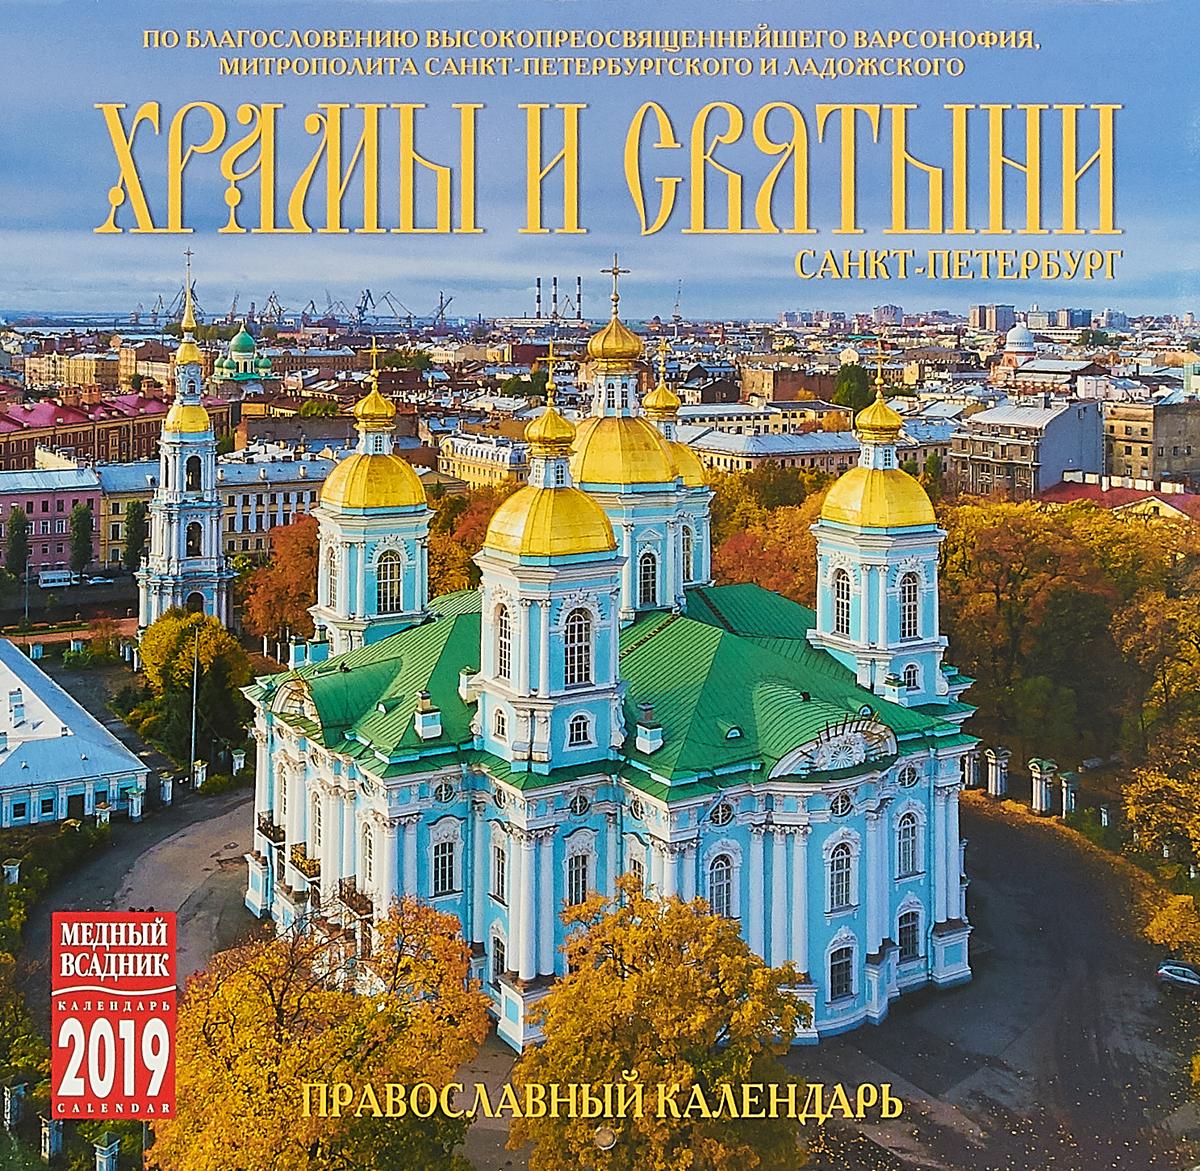 Календарь на спирали на 2019 год. Храмы и святыни Санкт-Петербурга календарь на спирали на 2019 год стражи санкт петербурга